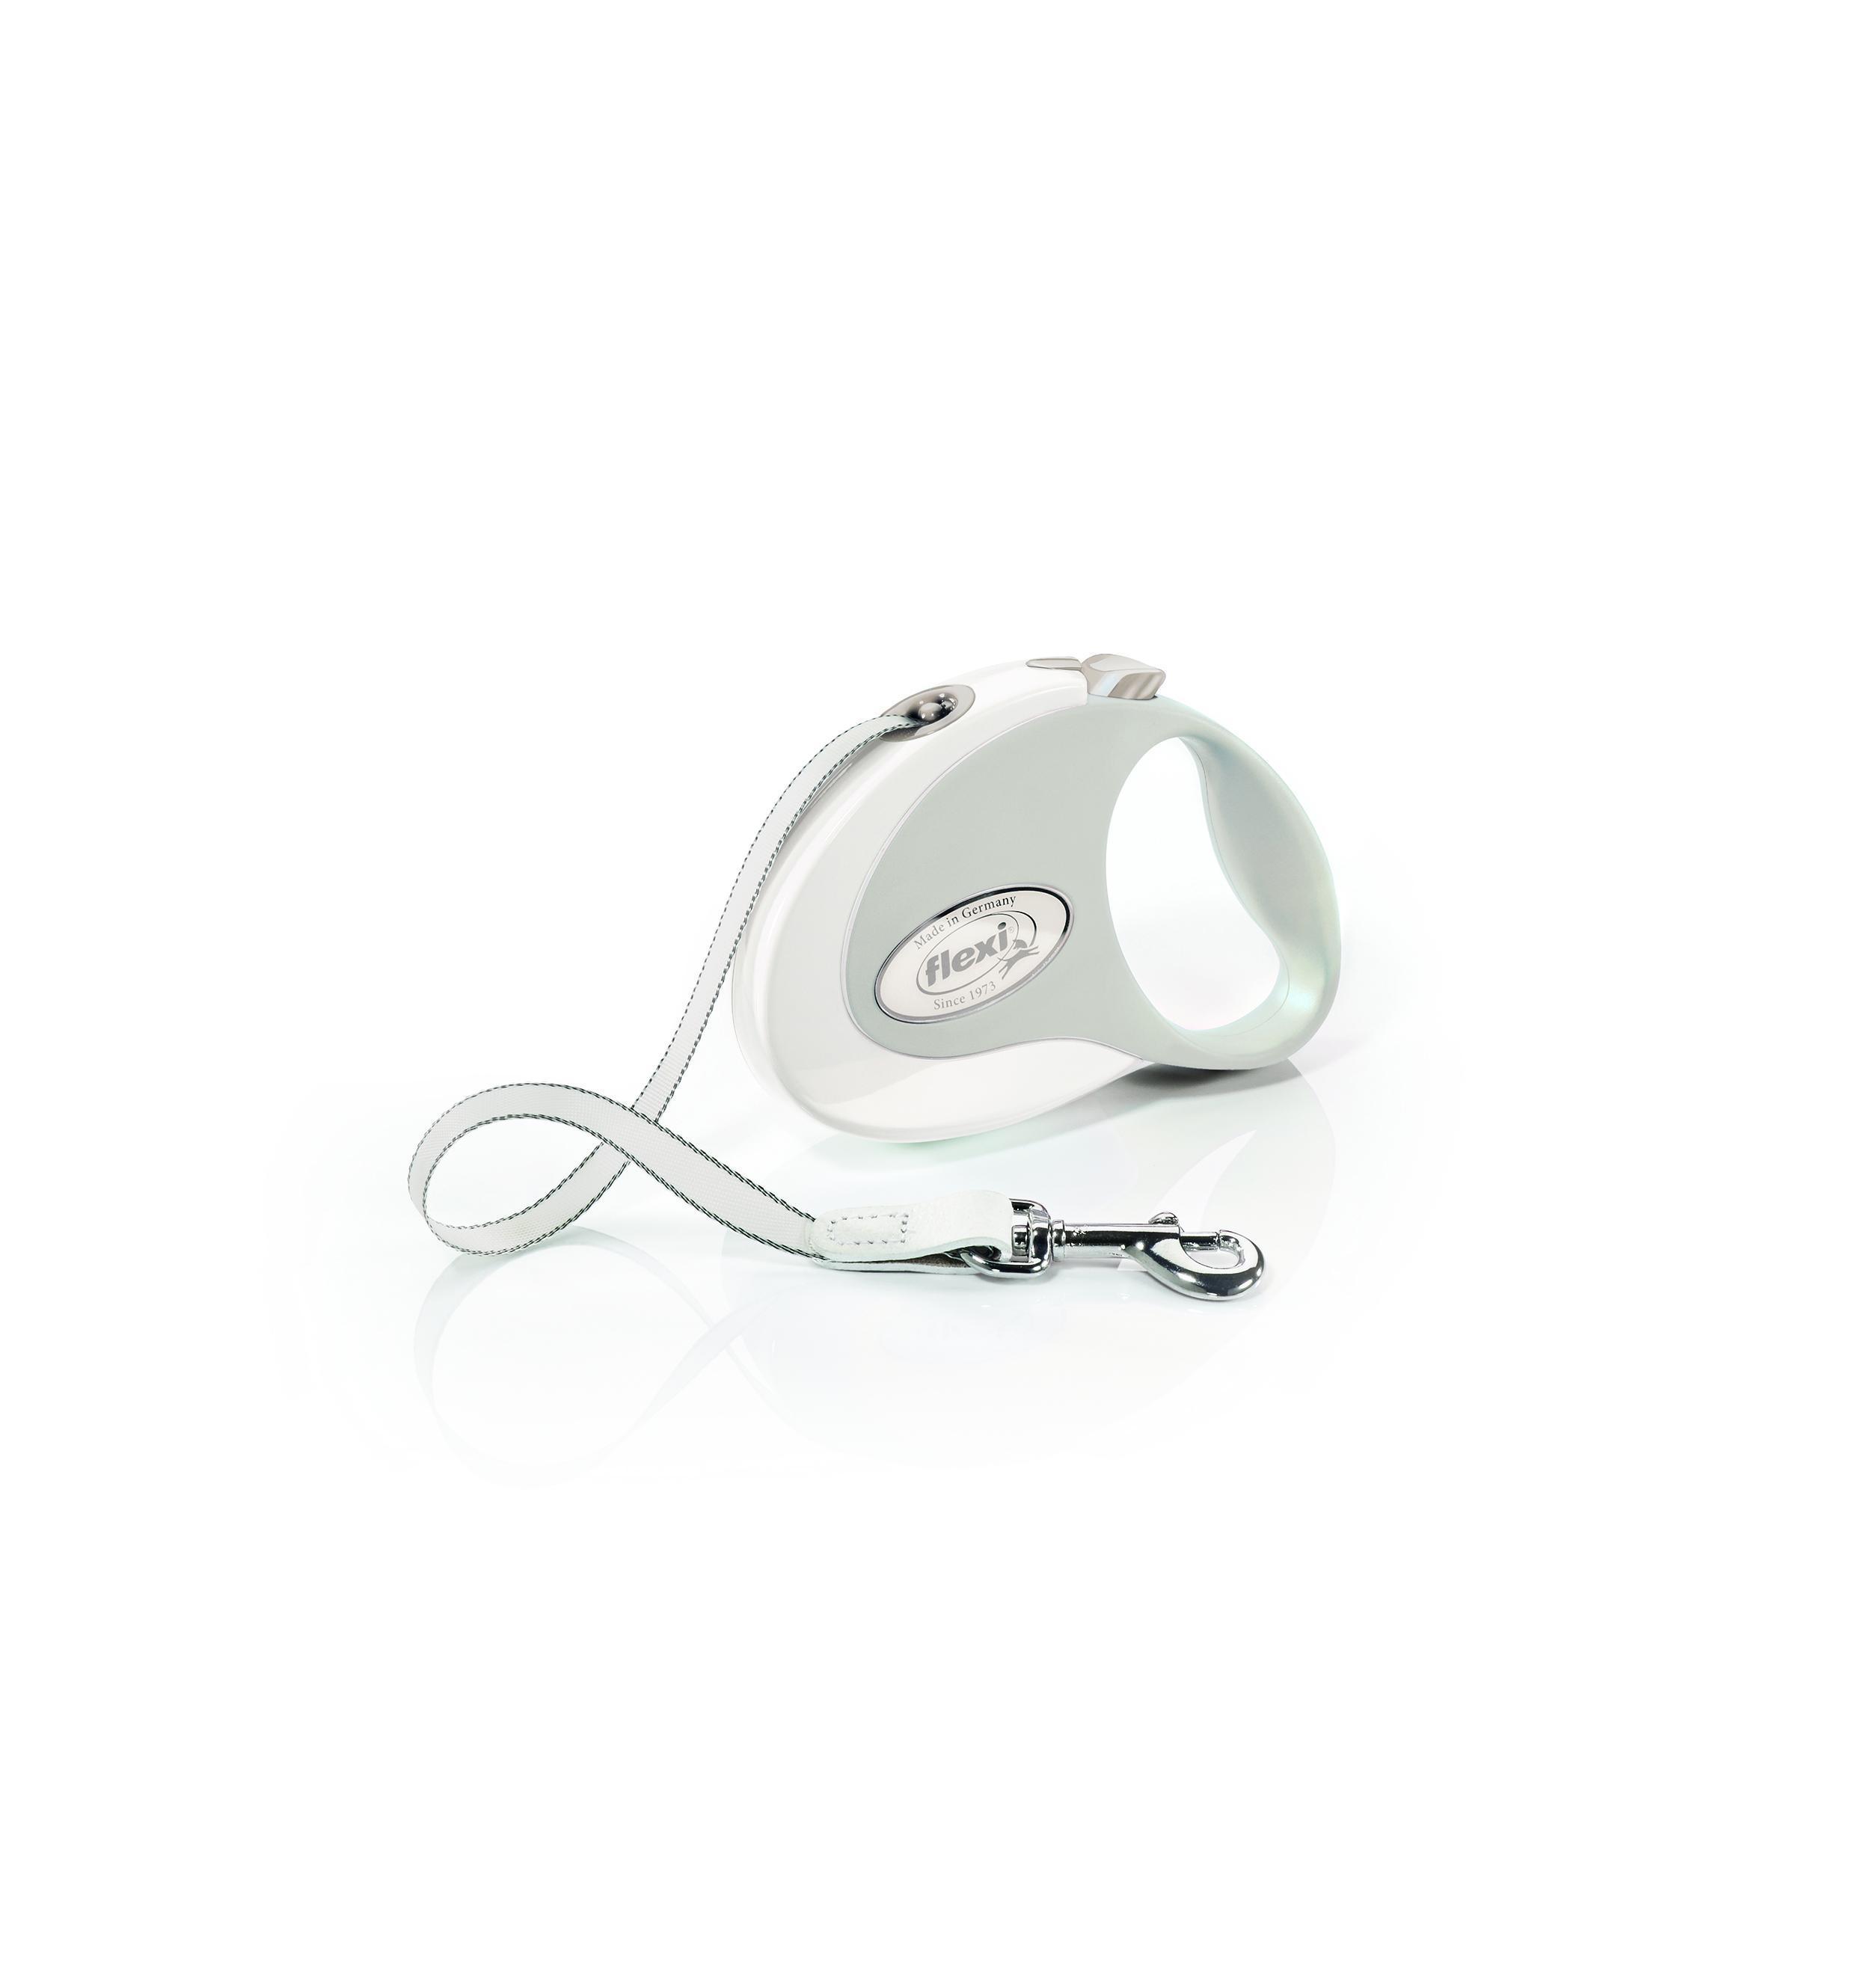 Flexi New Style Tape Dog Leash, White/Gray, Medium, 10-ft